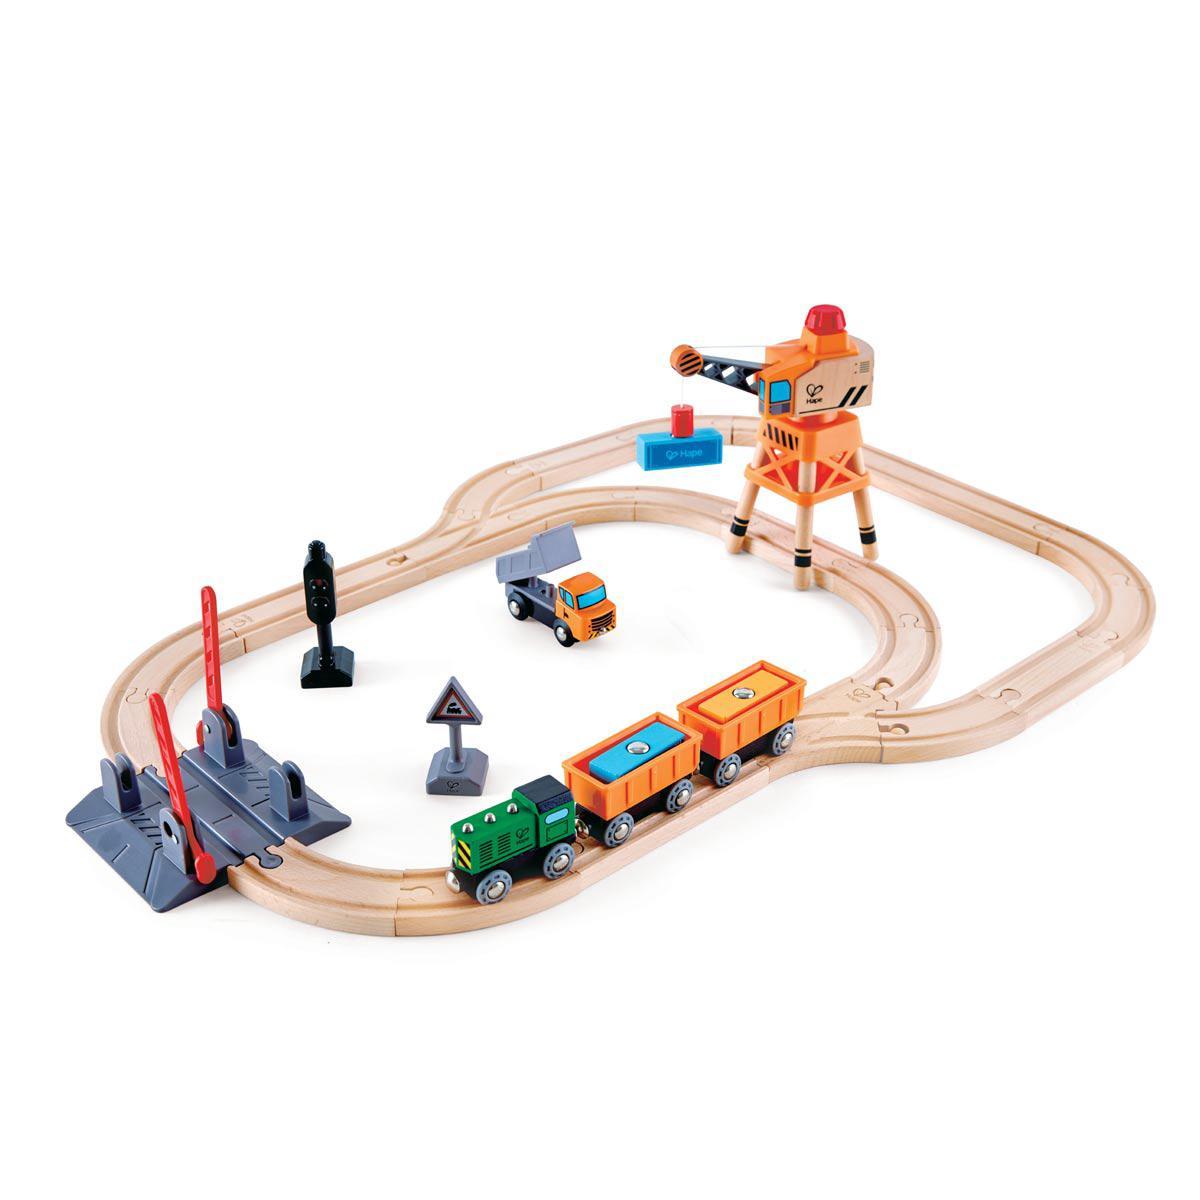 Circuit de train CROSSING AND CRANE Hape